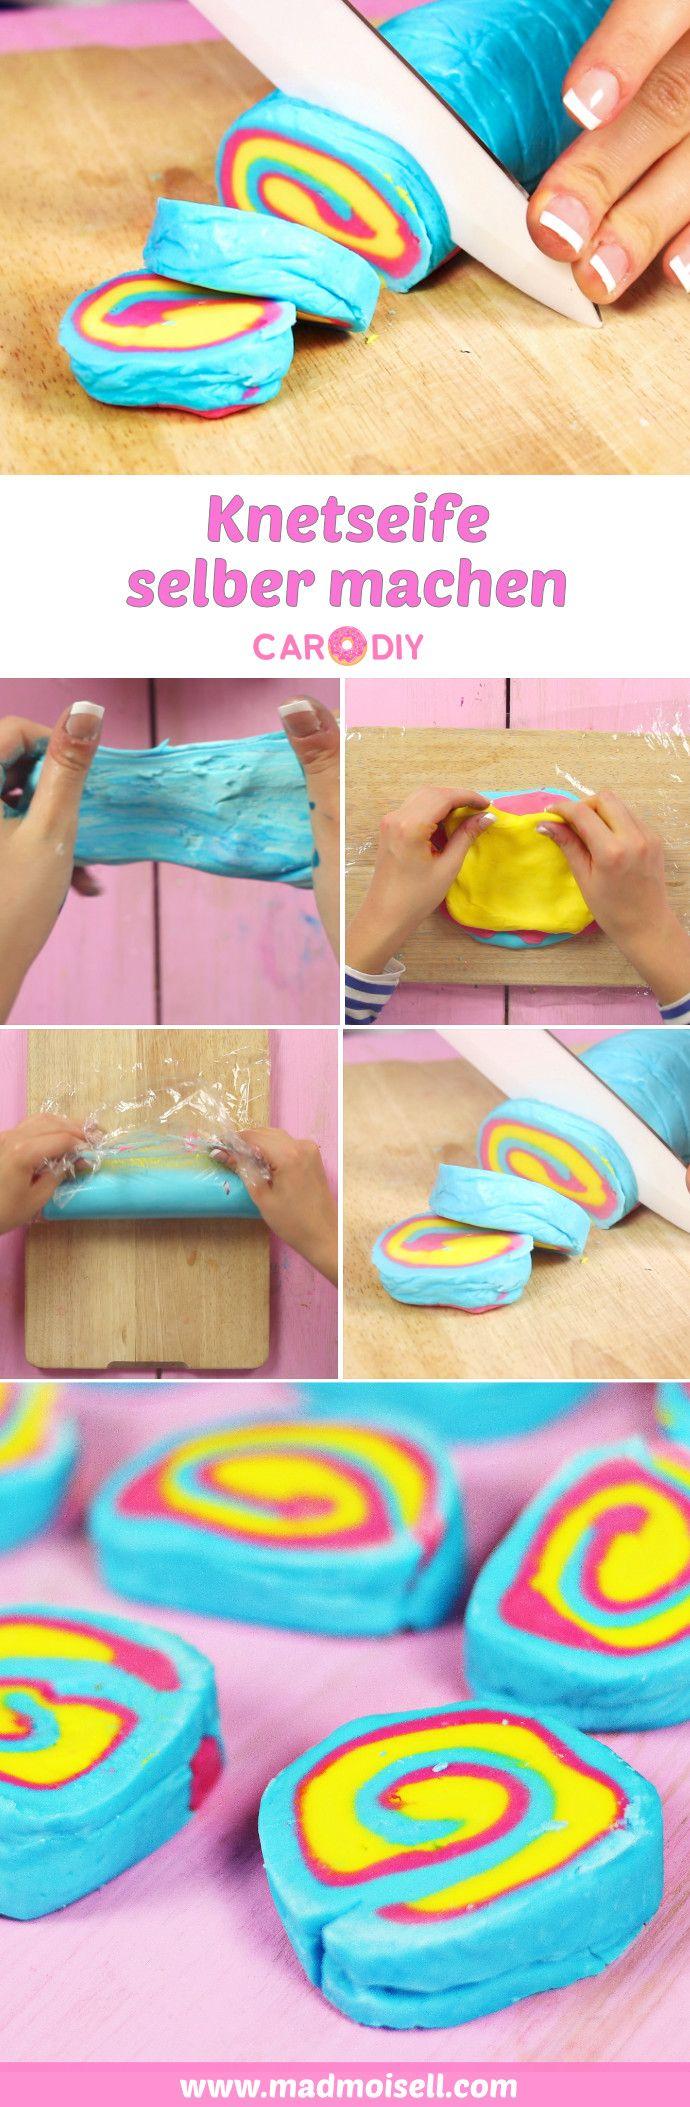 DIY Lush Knetseife selber machen – Lush Produkte selber machen #badekugelnselbermachen